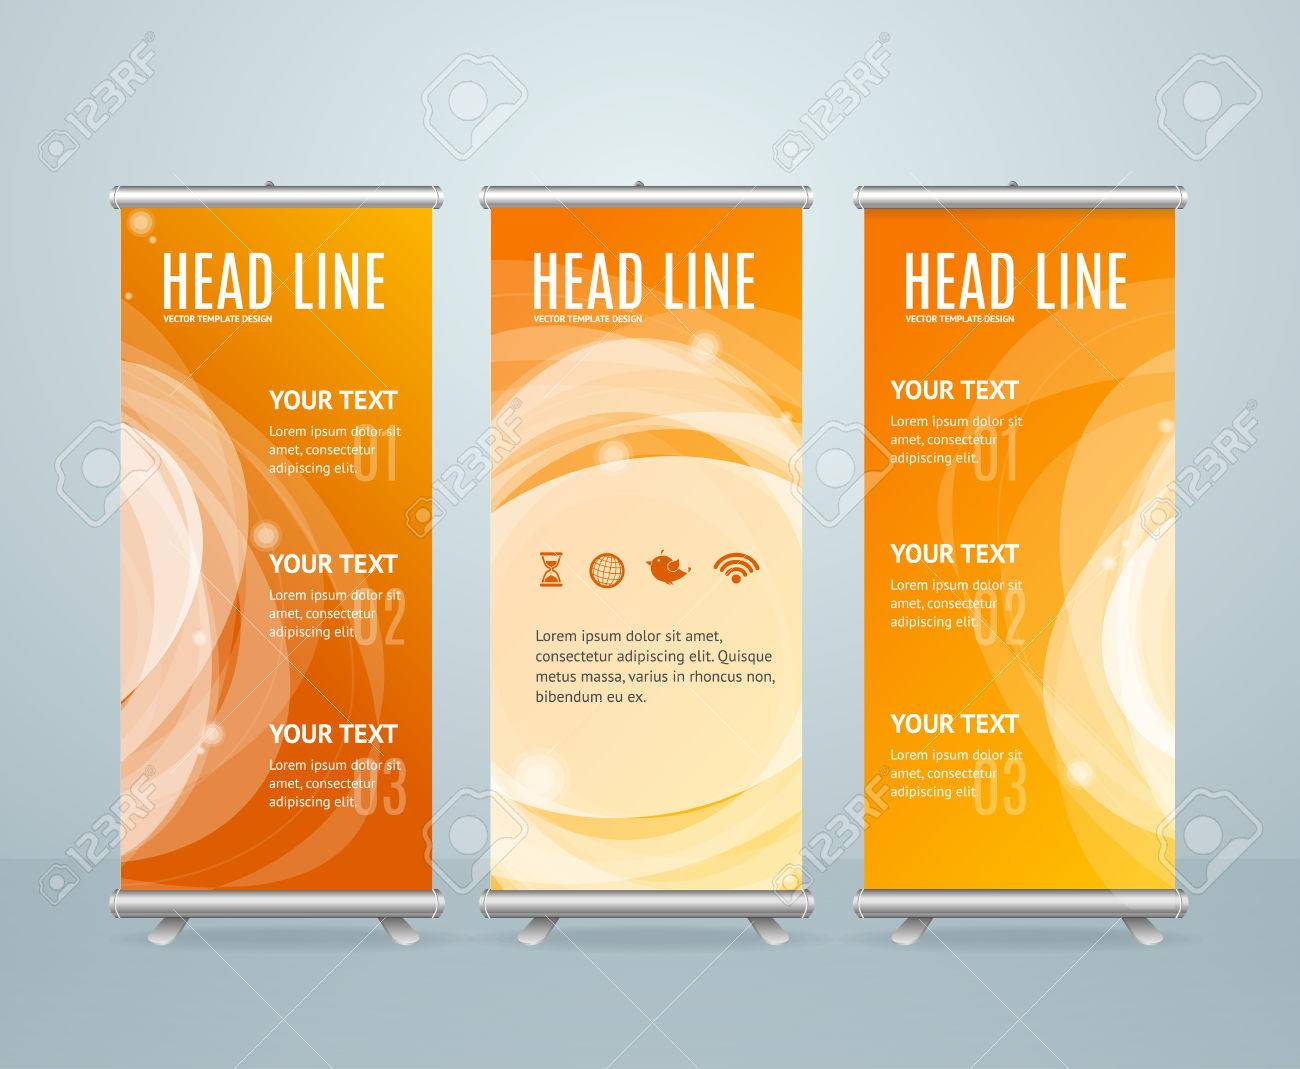 Roll Up Banner Stand Design Template On Orange Background. Vector illustration - 55548967